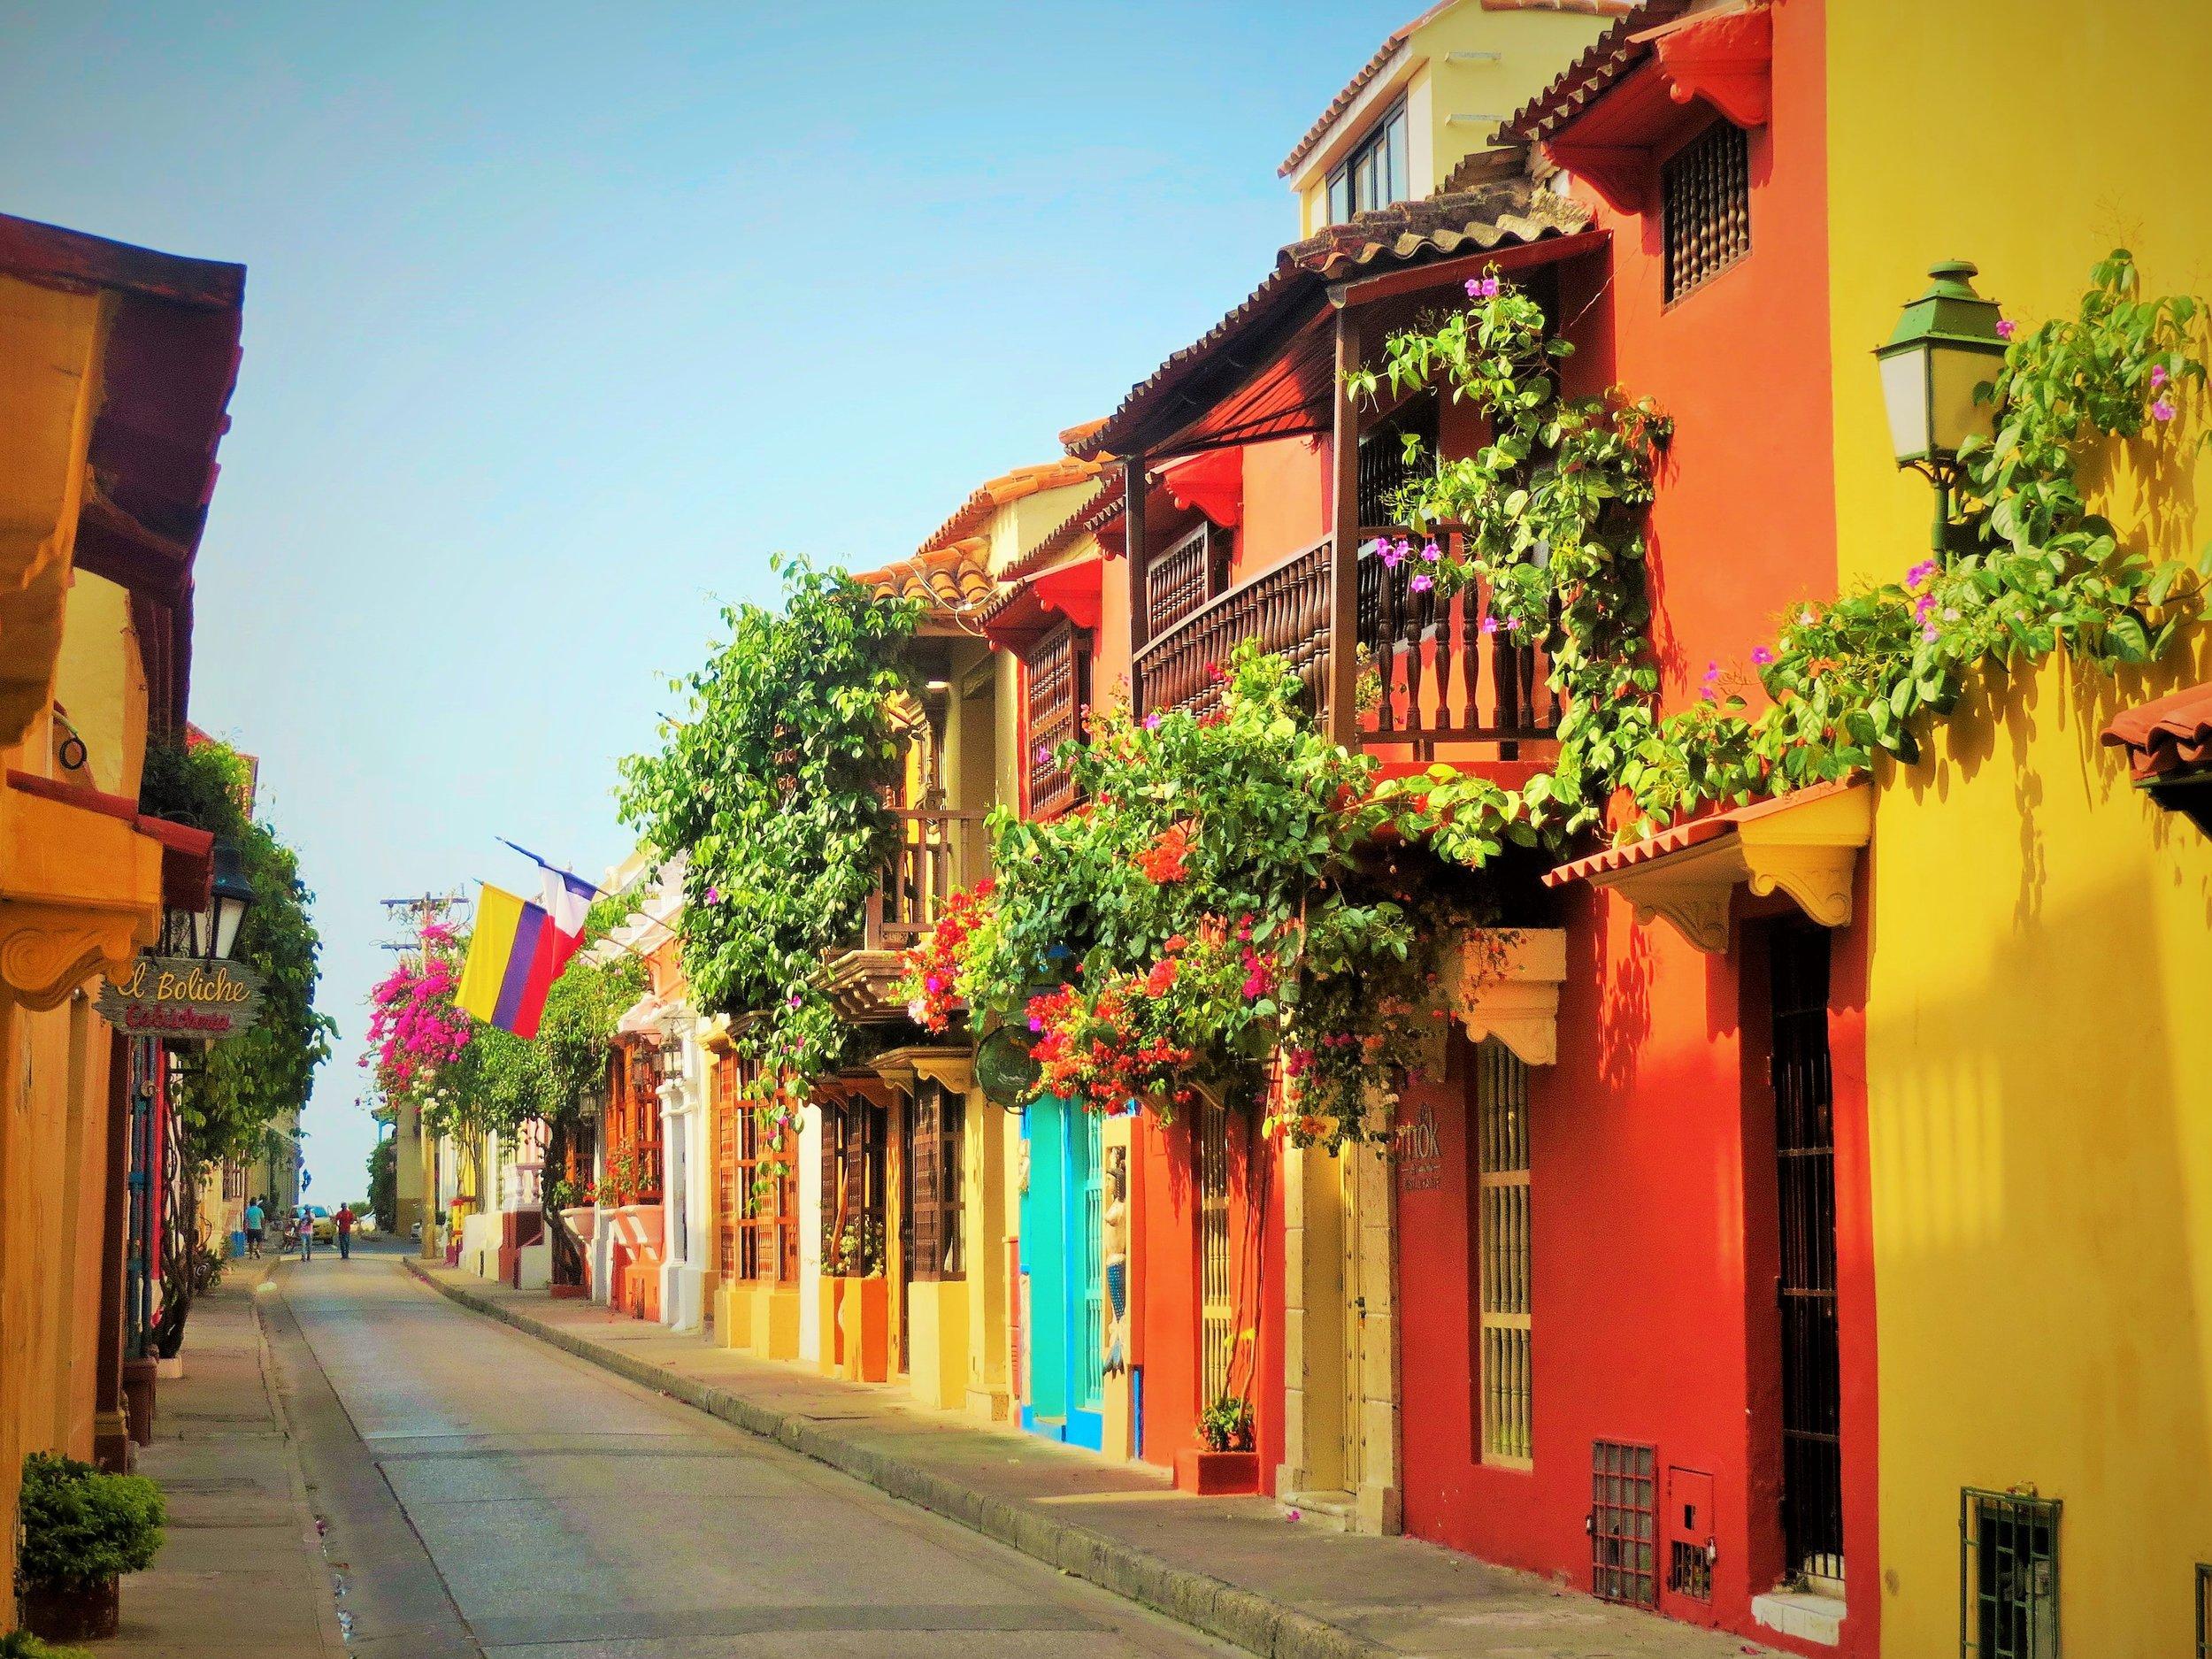 Colorful Cartagena, Colombia